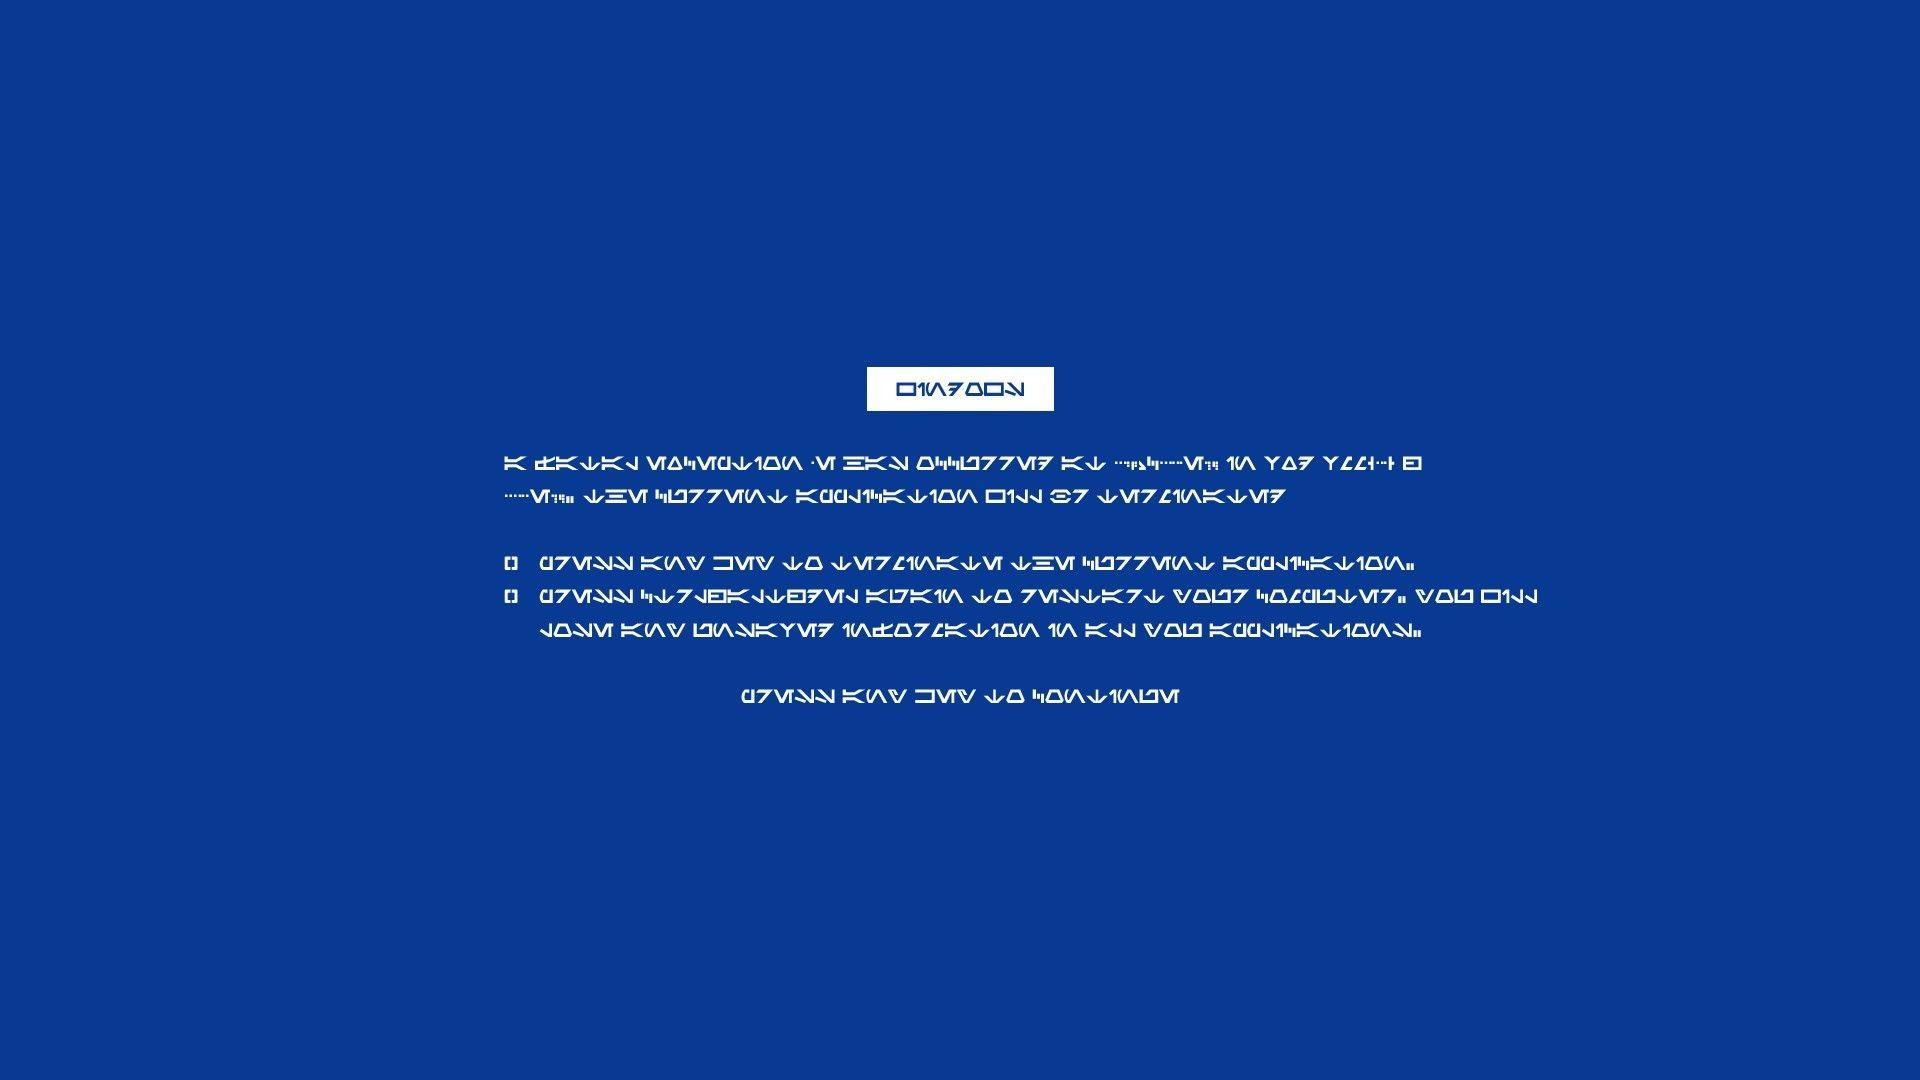 General 1920x1080 Blue Screen of Death text simple background Windows technology errors Windows Errors humor computer Microsoft Windows Aurebesh